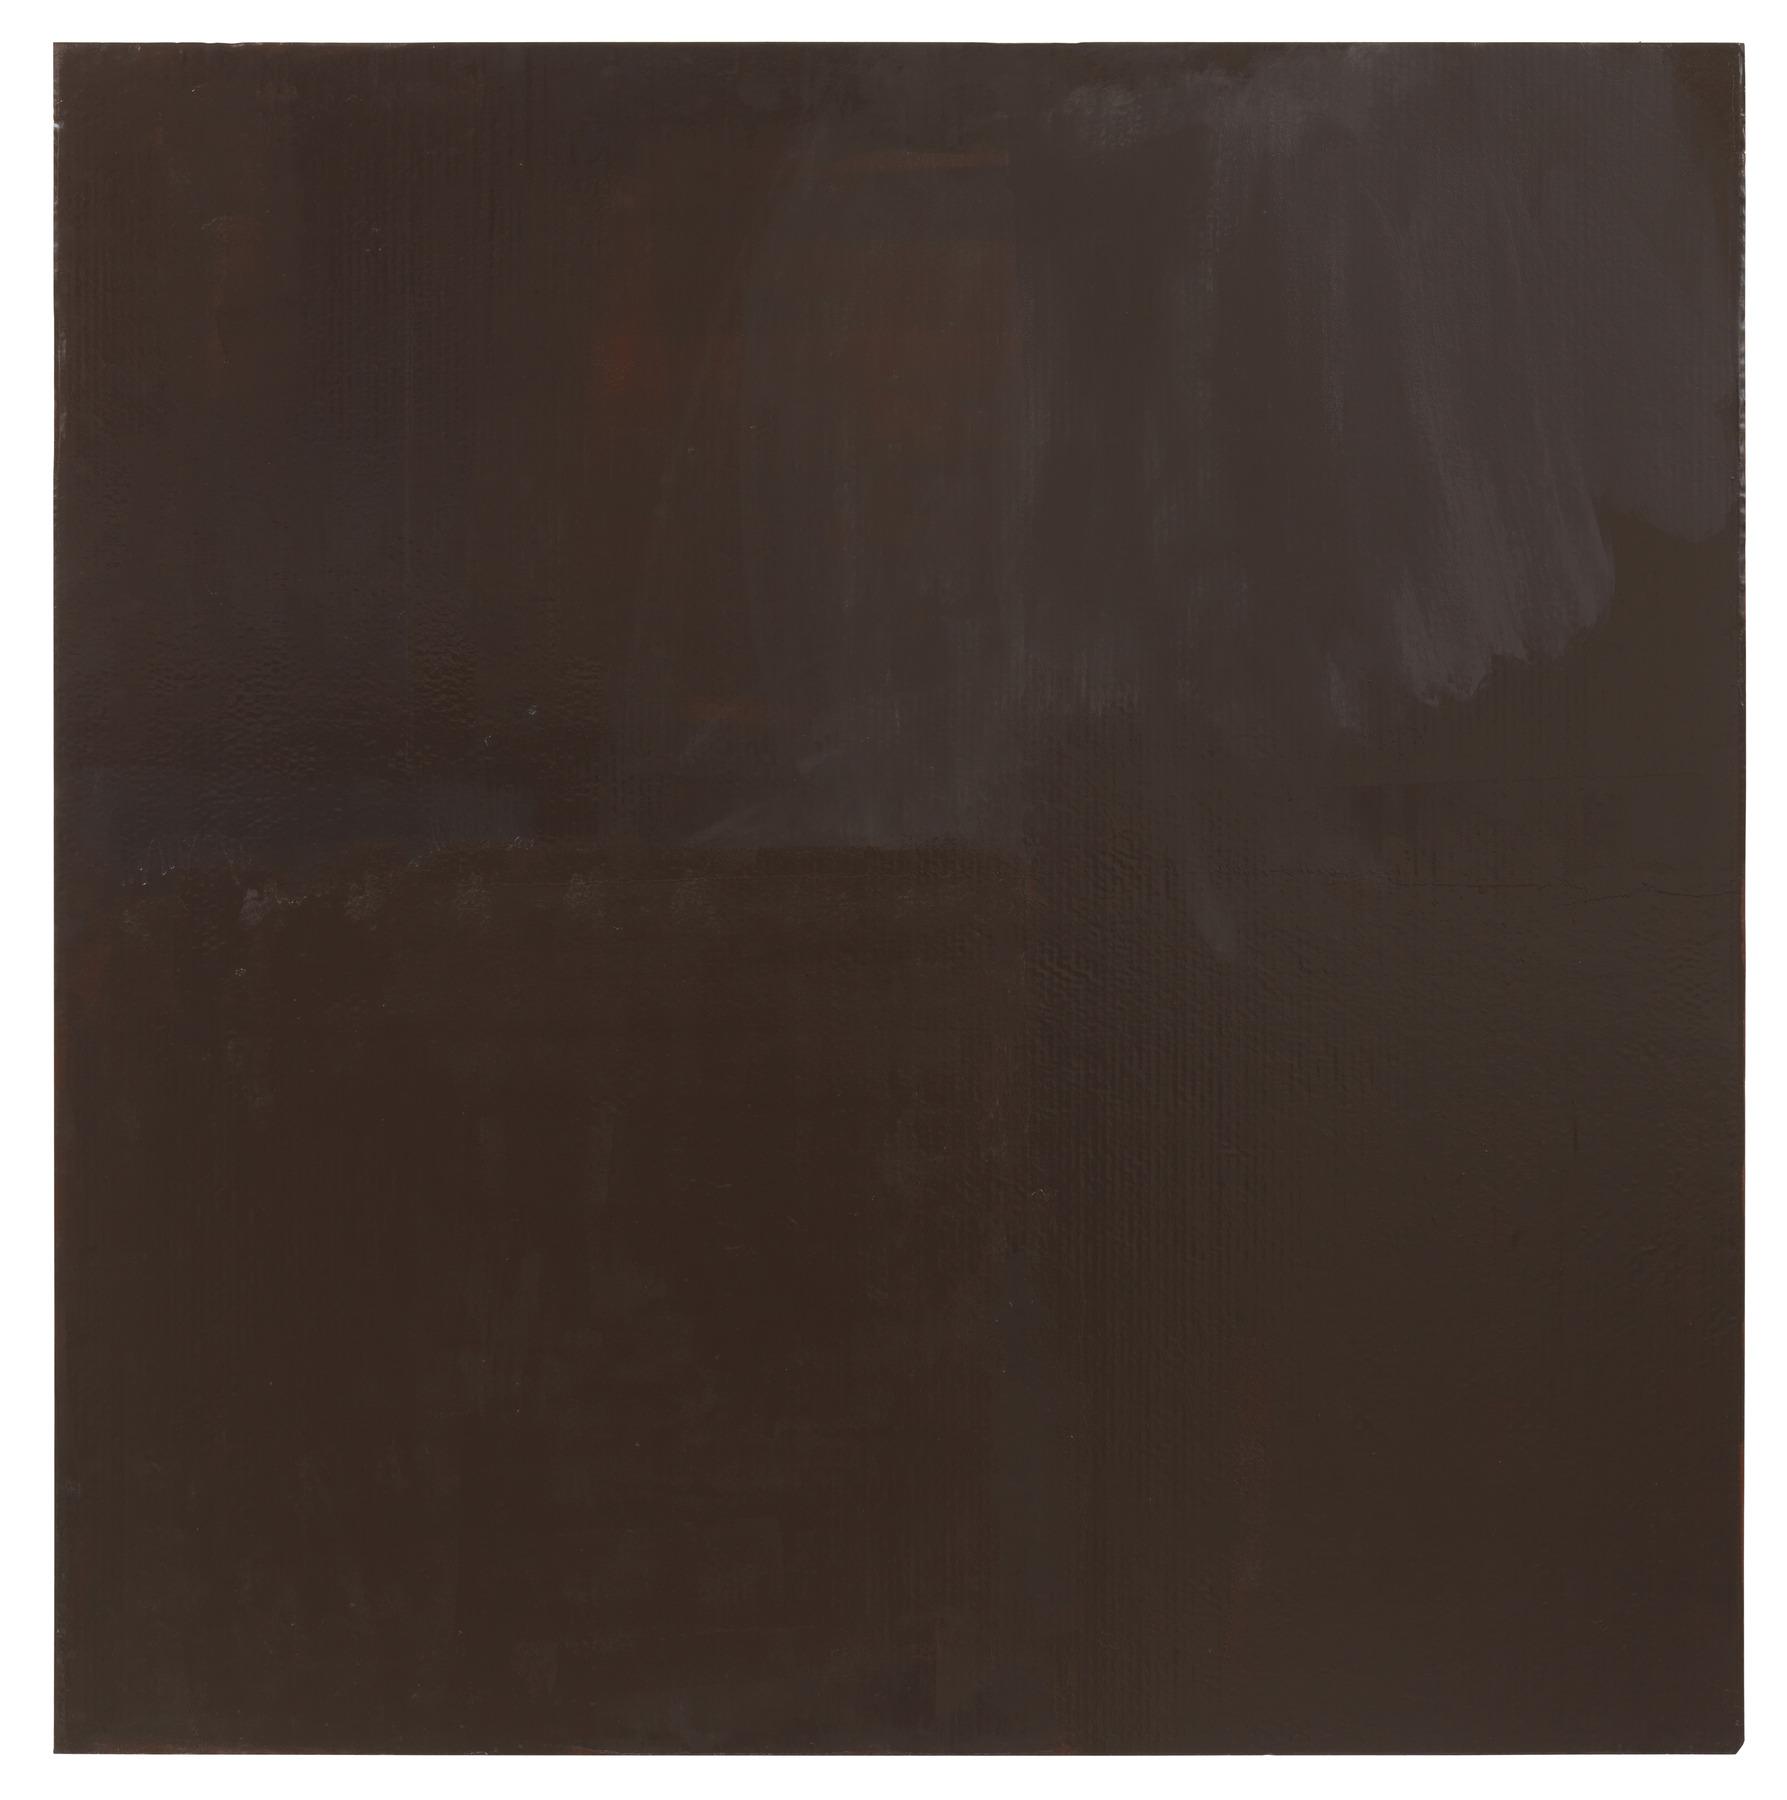 Galerie Joseph Tang _Alexander Lieck_Oci Ciornie_2015_09